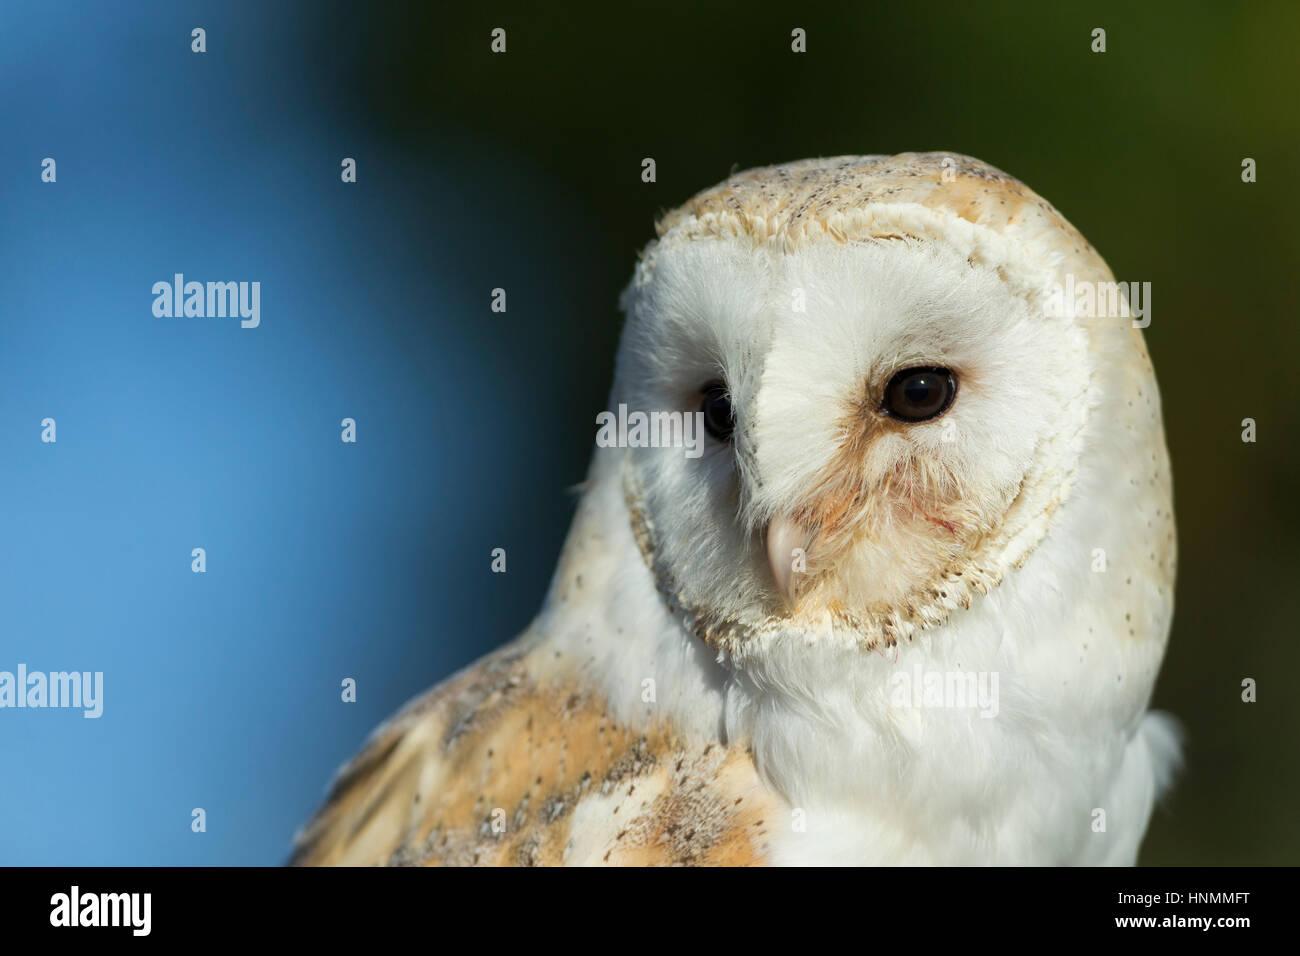 Schleiereule Tyto Alba (Captive), Erwachsene weibliche, Profil, Hawk Conservancy Trust, Hampshire, UK im November. Stockbild